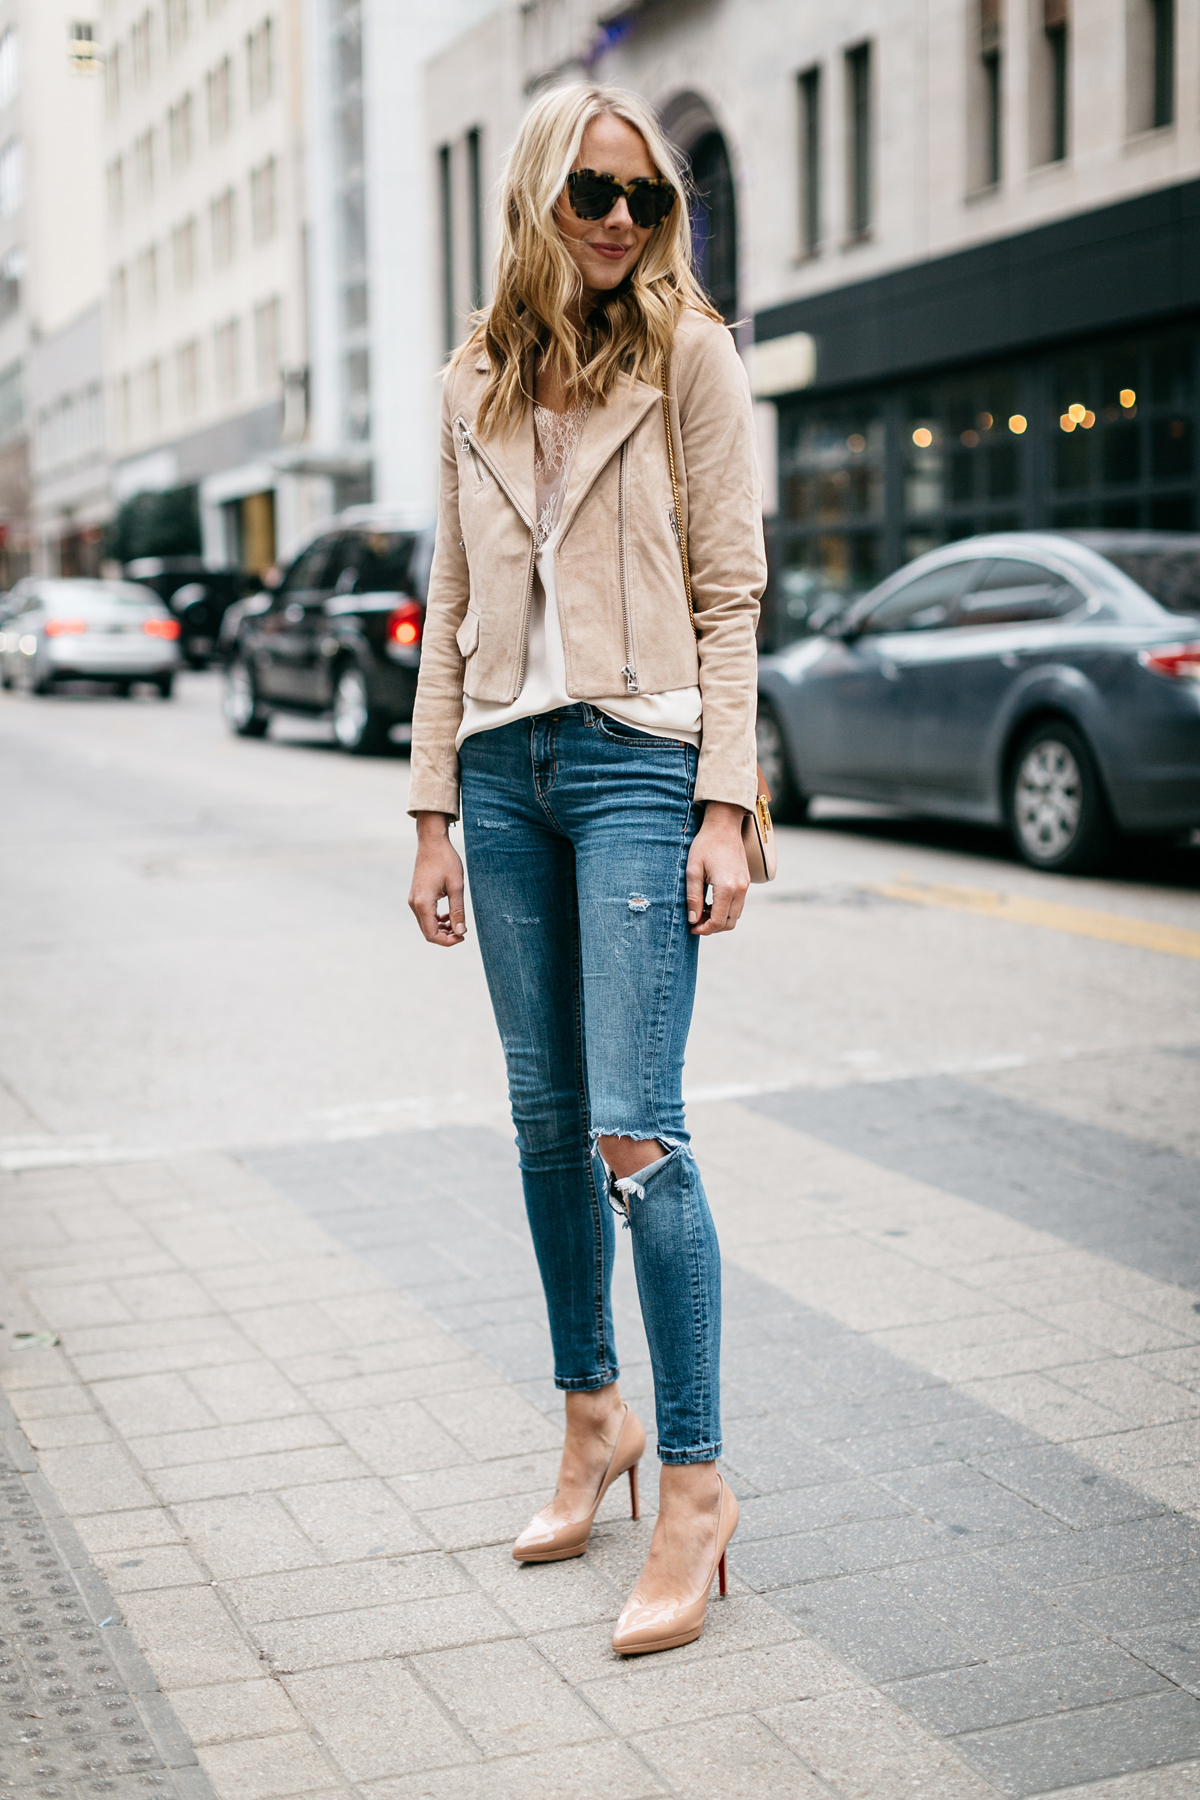 casual outfit valentine jackson spring valentines jeans fashionjackson chloe jacket